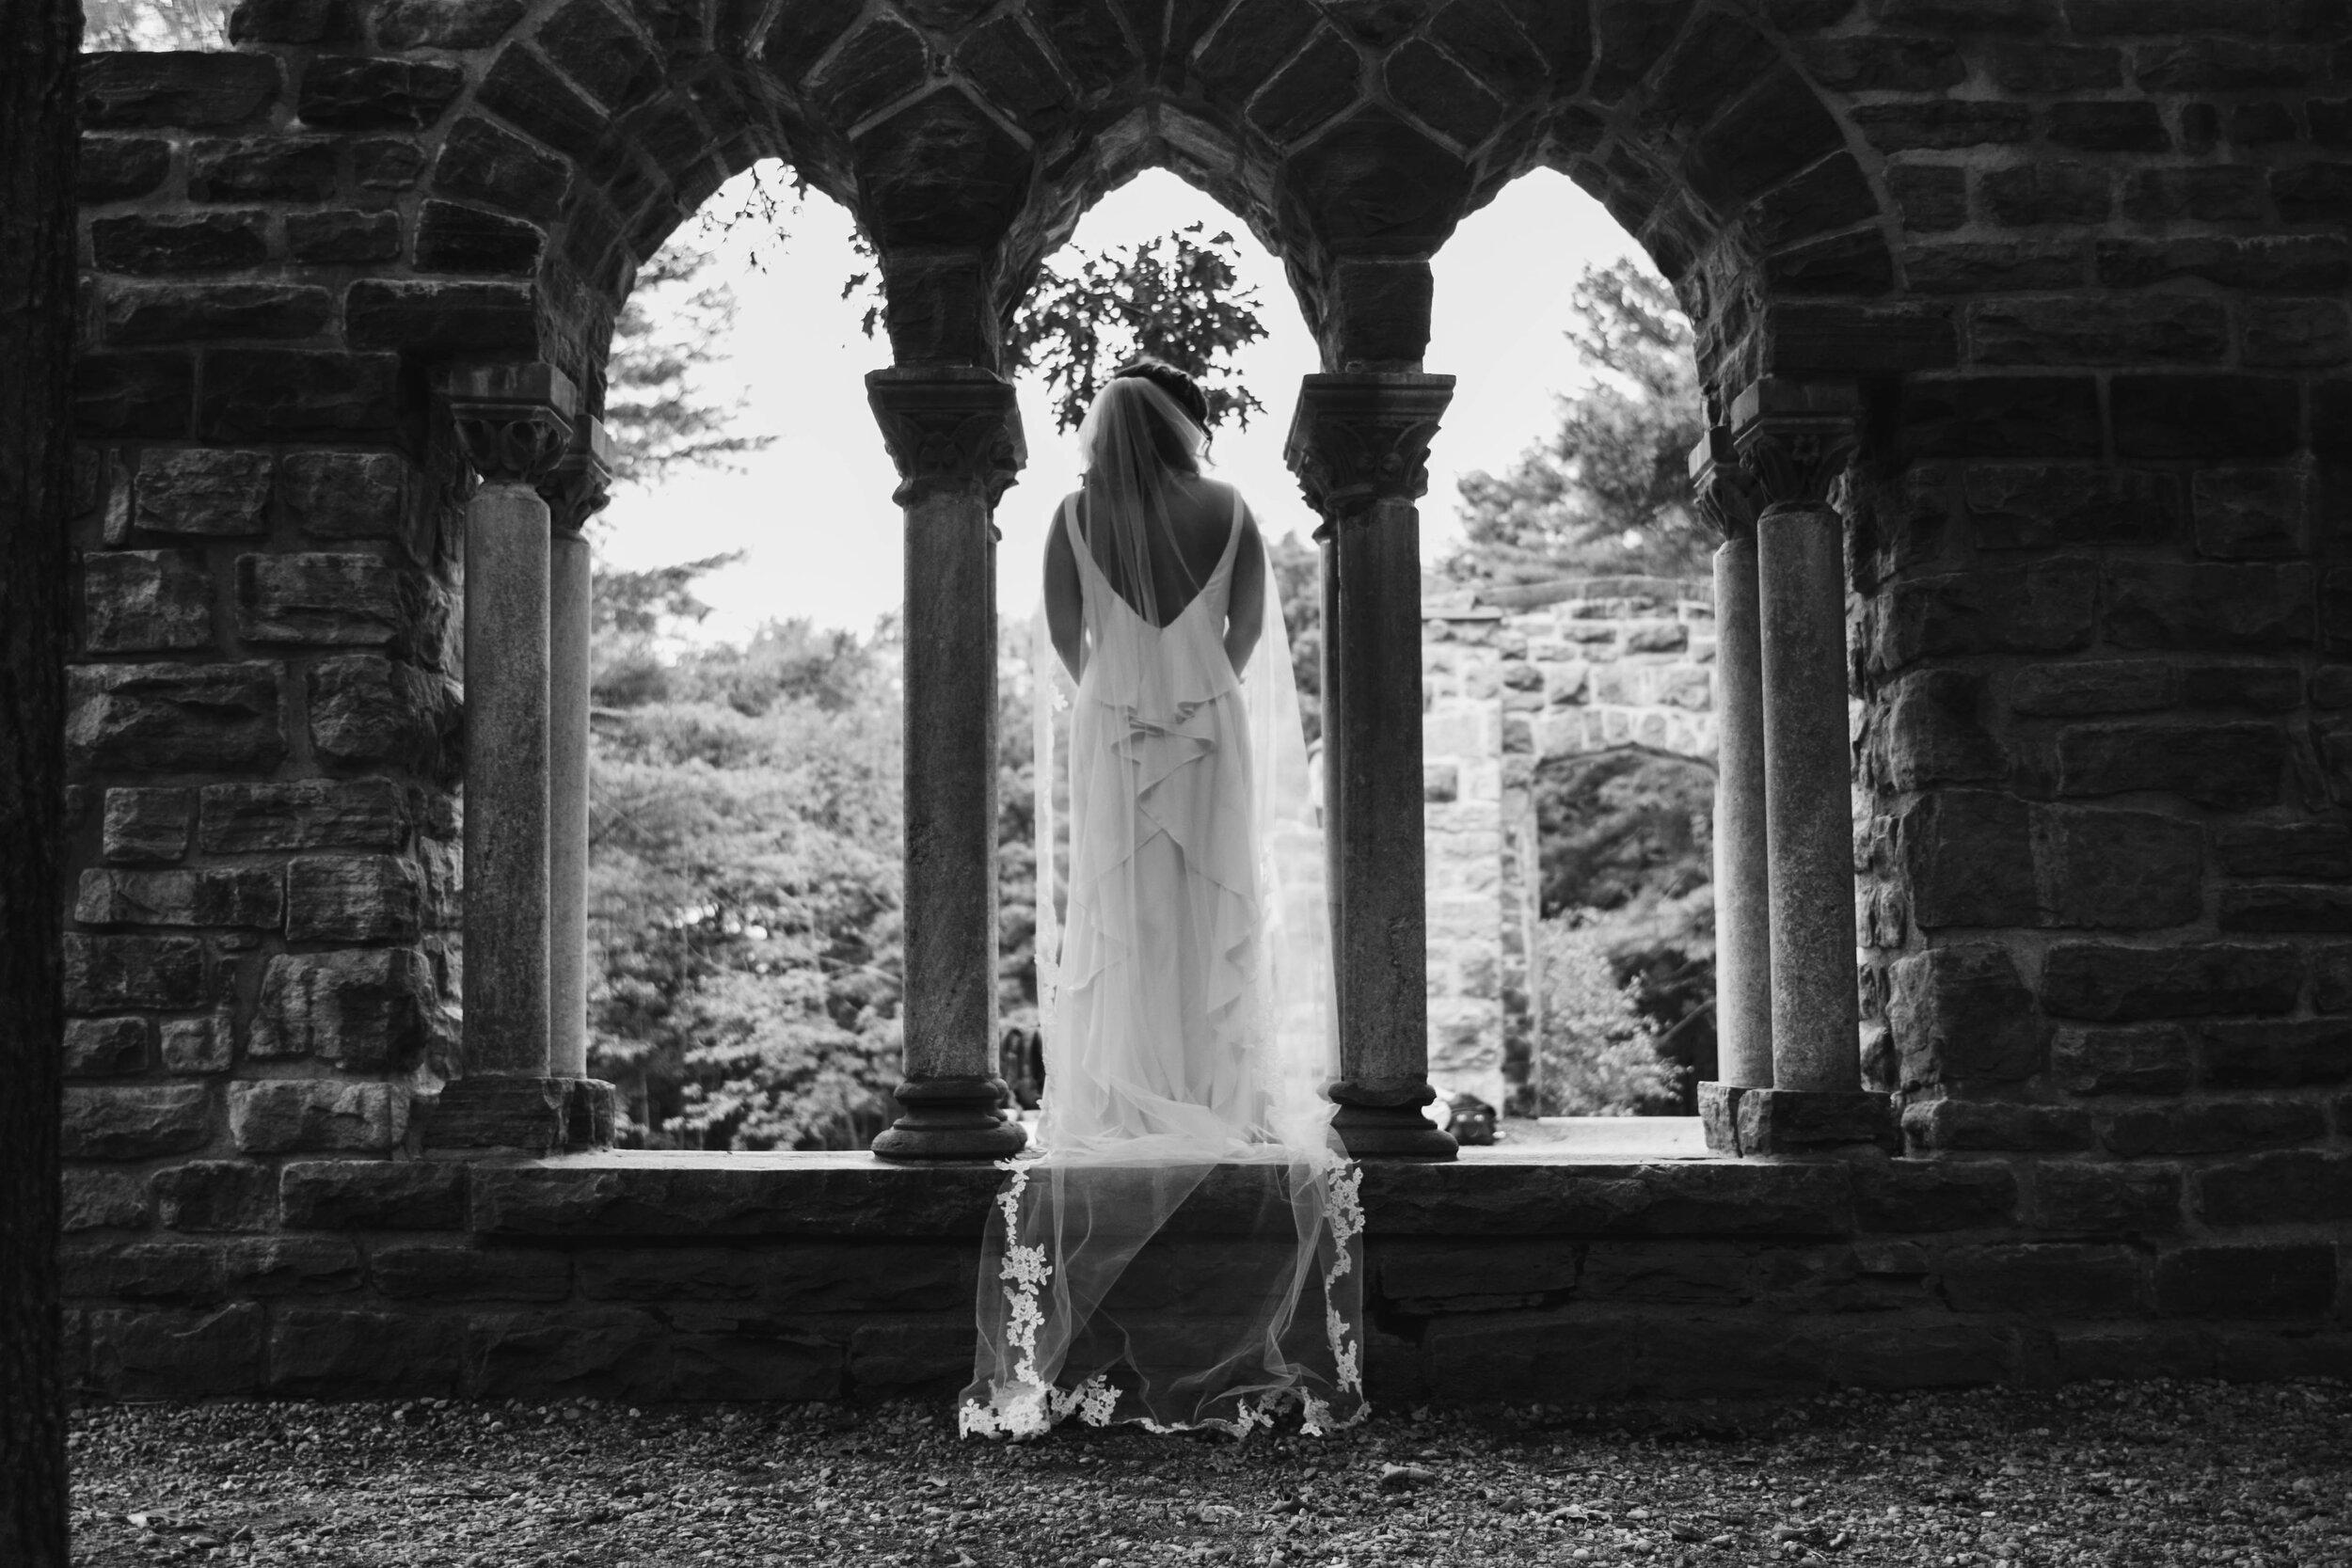 wedding-dress-veils-trains-lengths.jpg